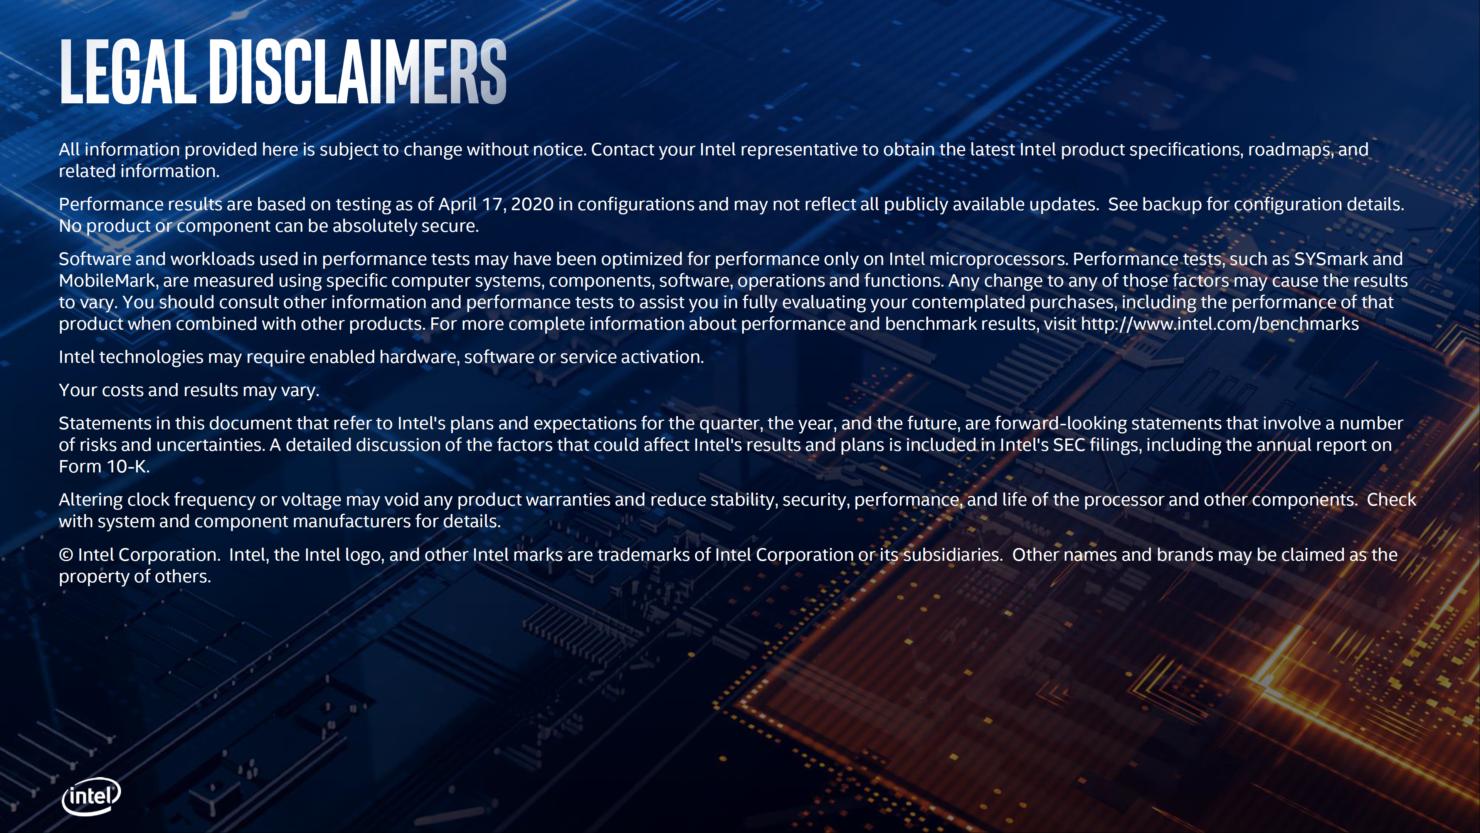 intel-10th-gen-comet-lake-s-desktop-cpu-z490-platform-official-launch_19